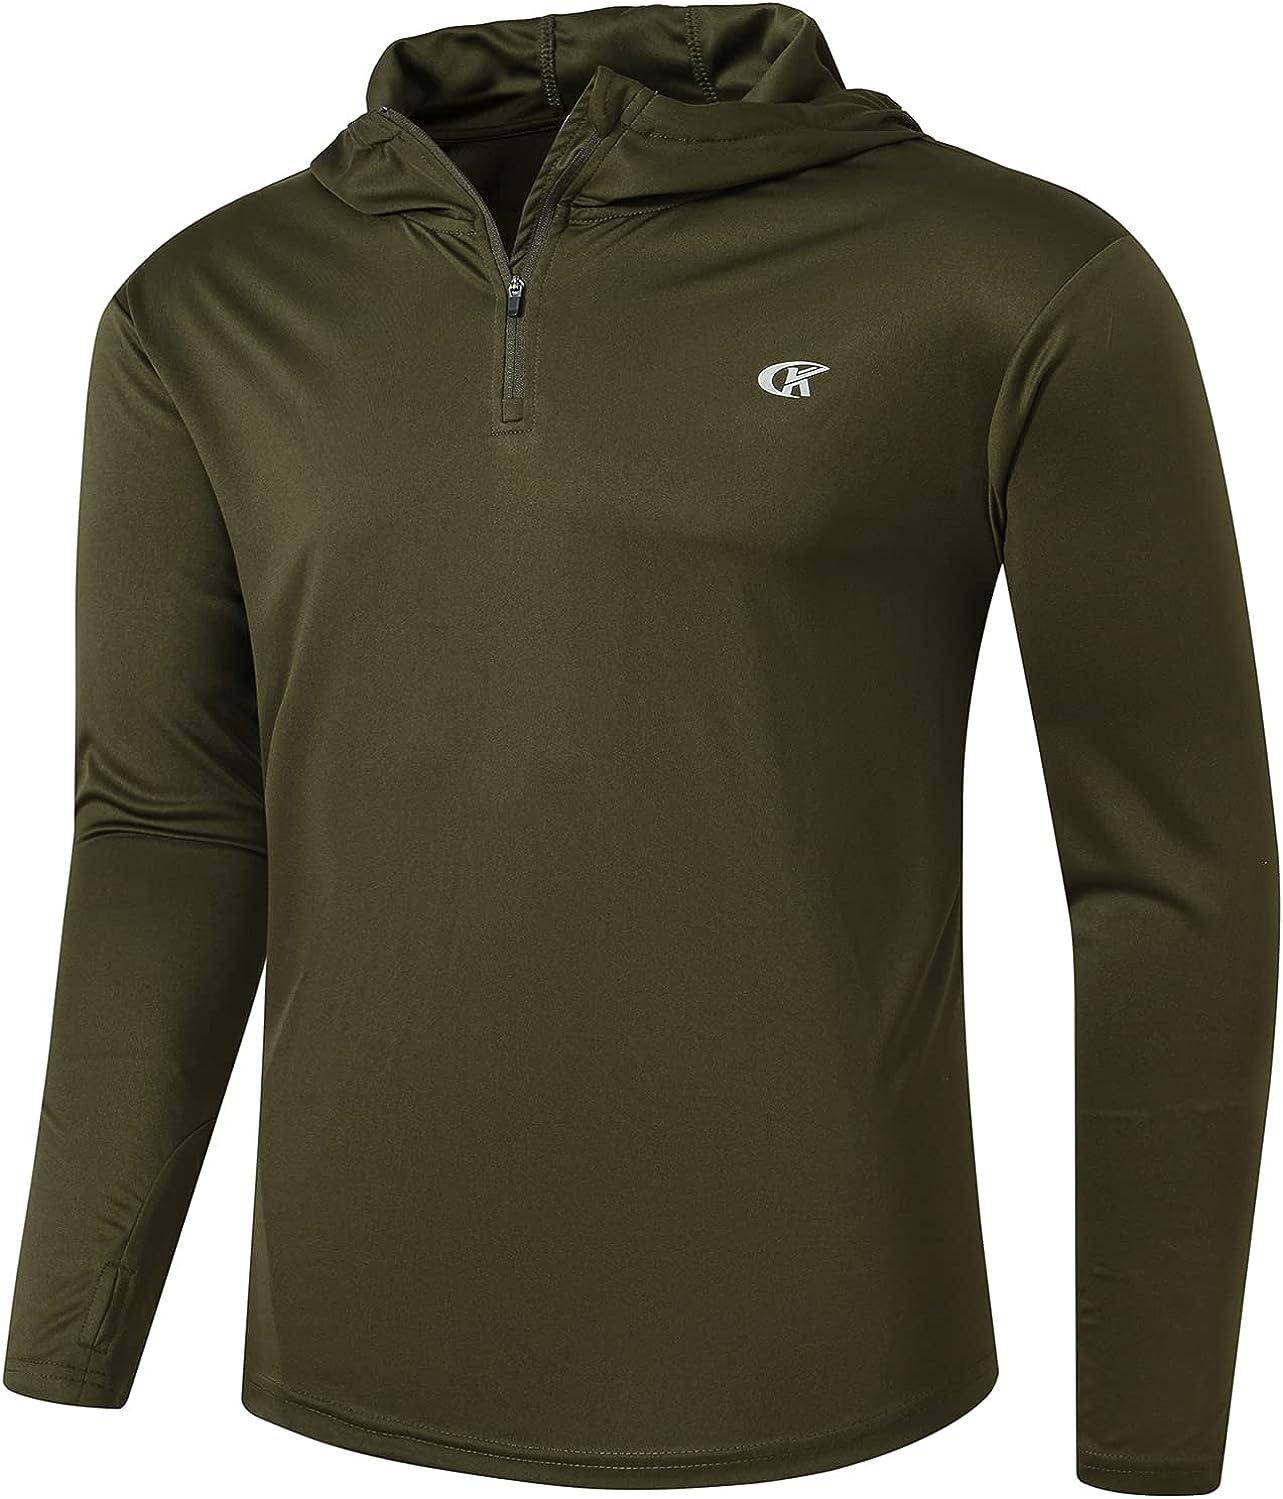 Satankud Men's UPF 50+ Sun Protection 1/4 Zip Long Sleeve Thumb Hiking Fishing Shirt